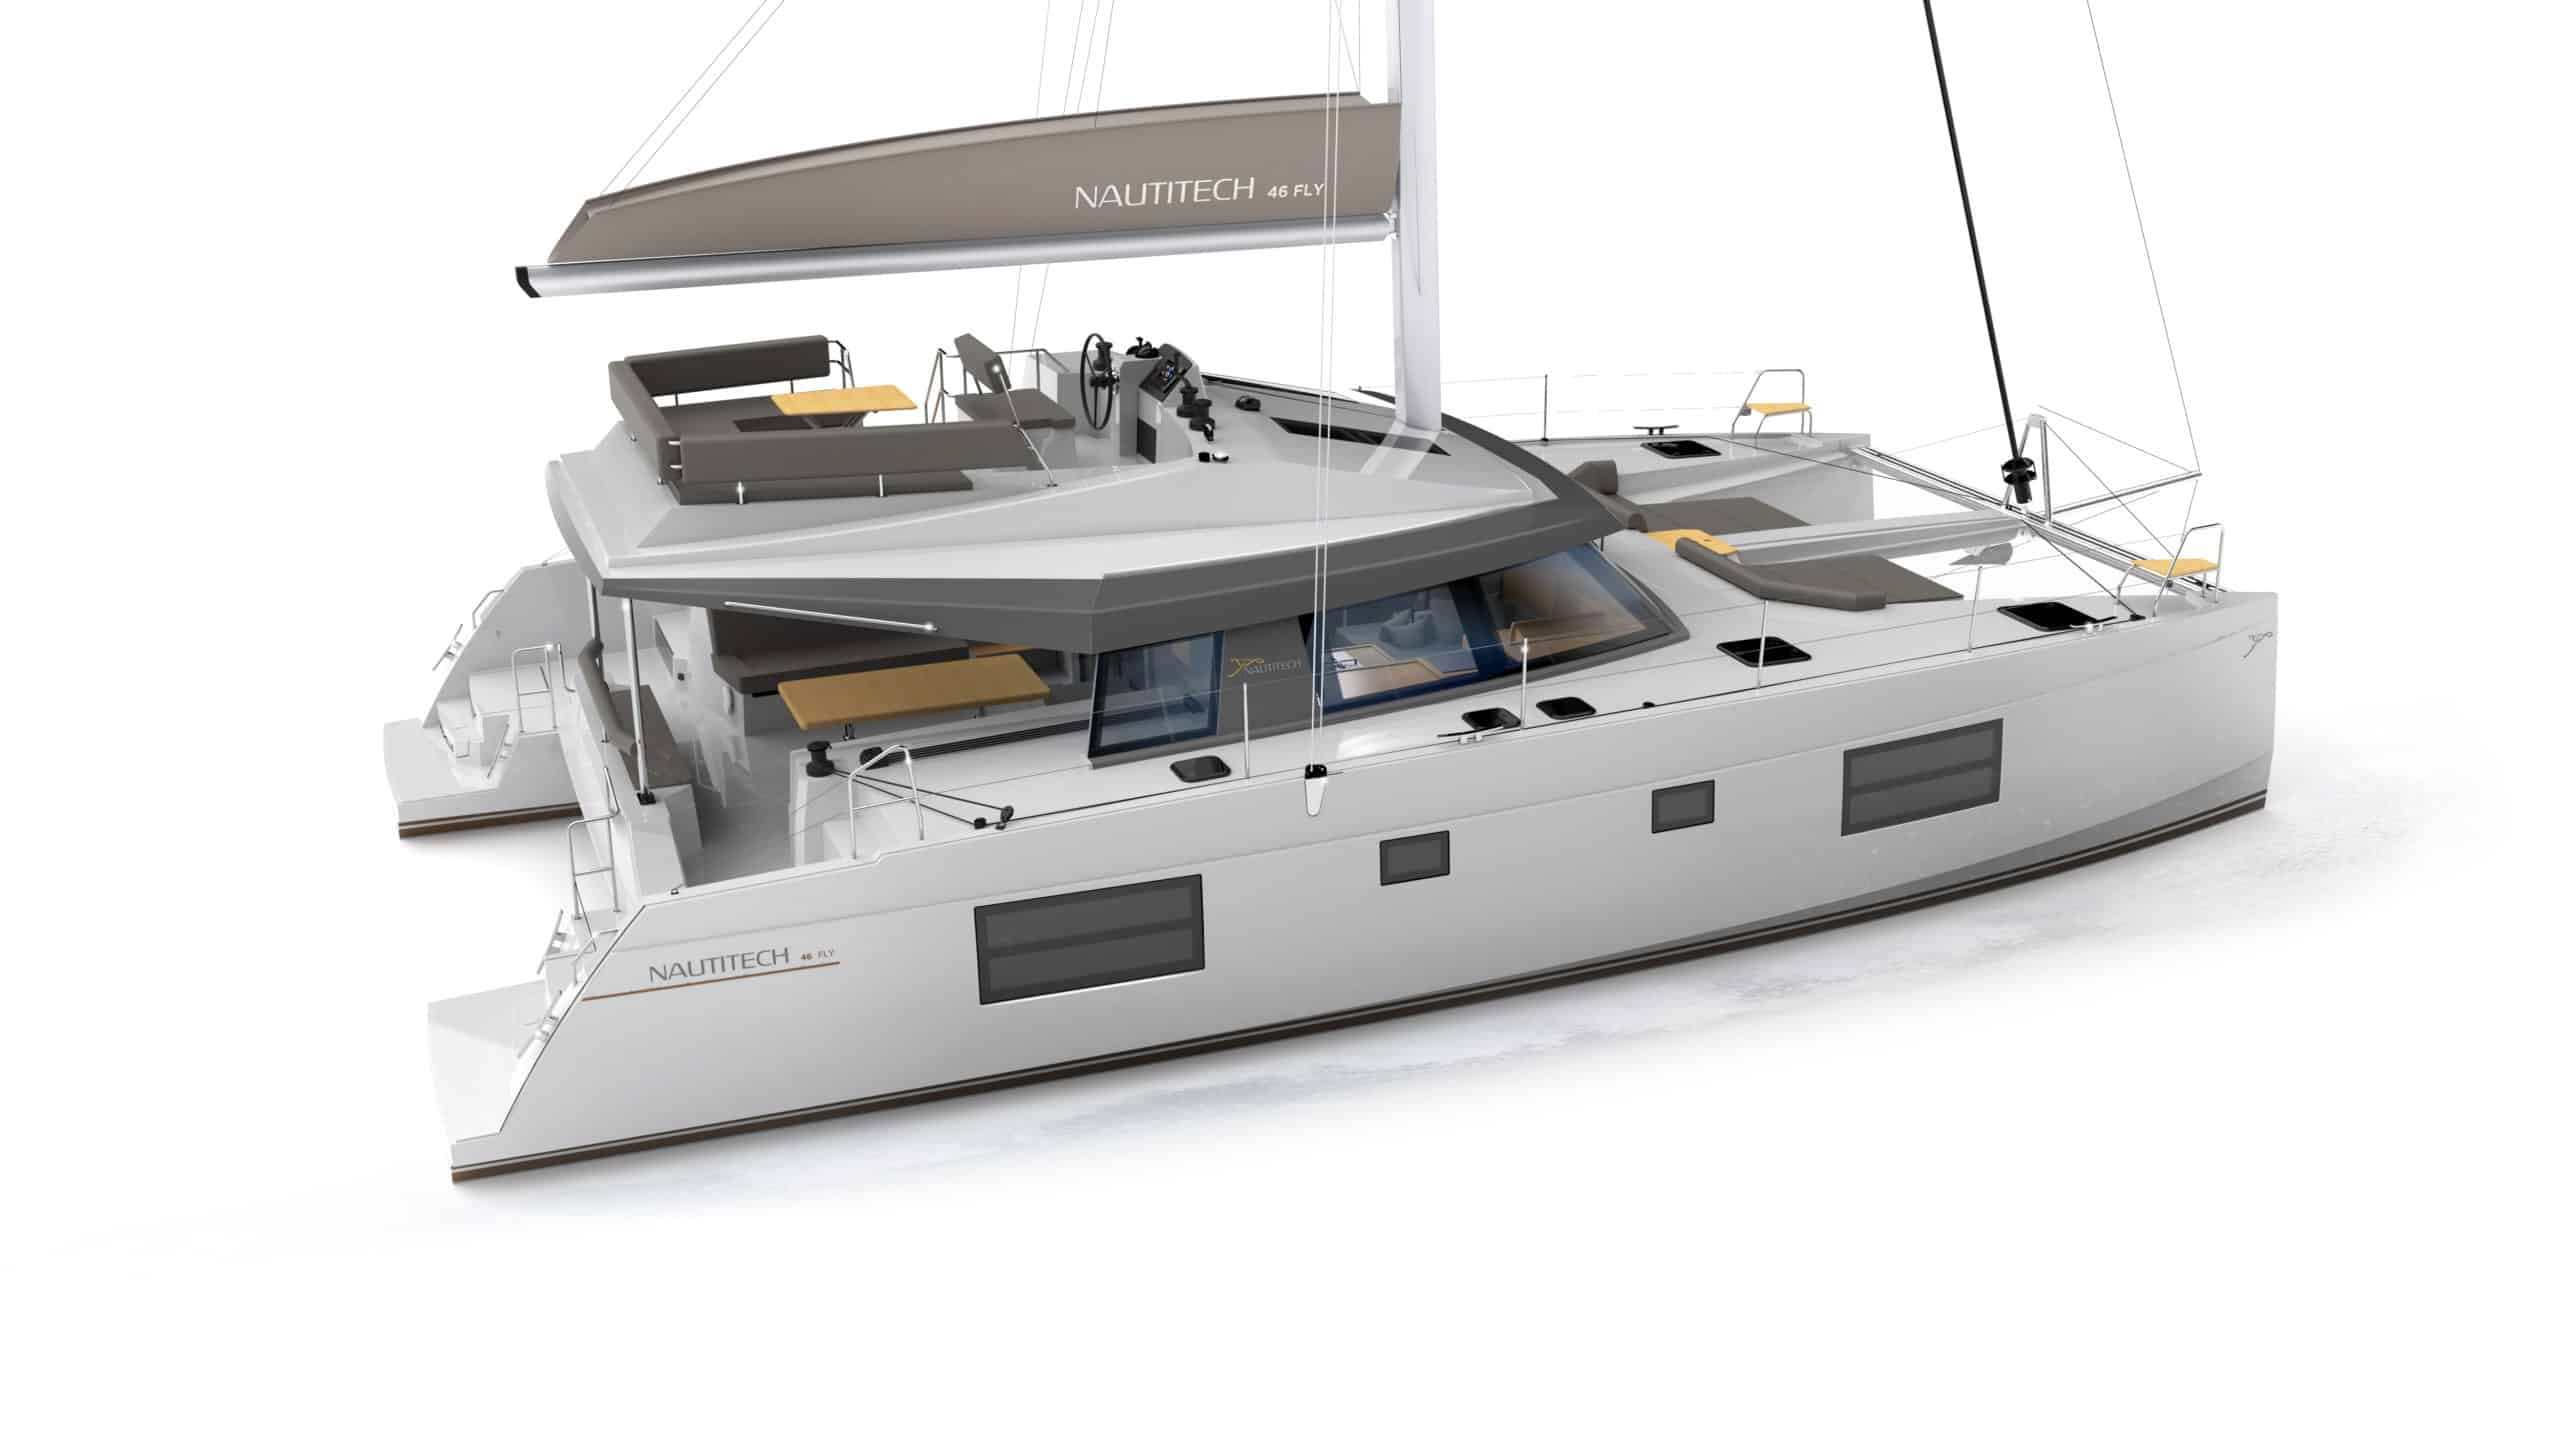 nautitech 46 flybridge model catamaran